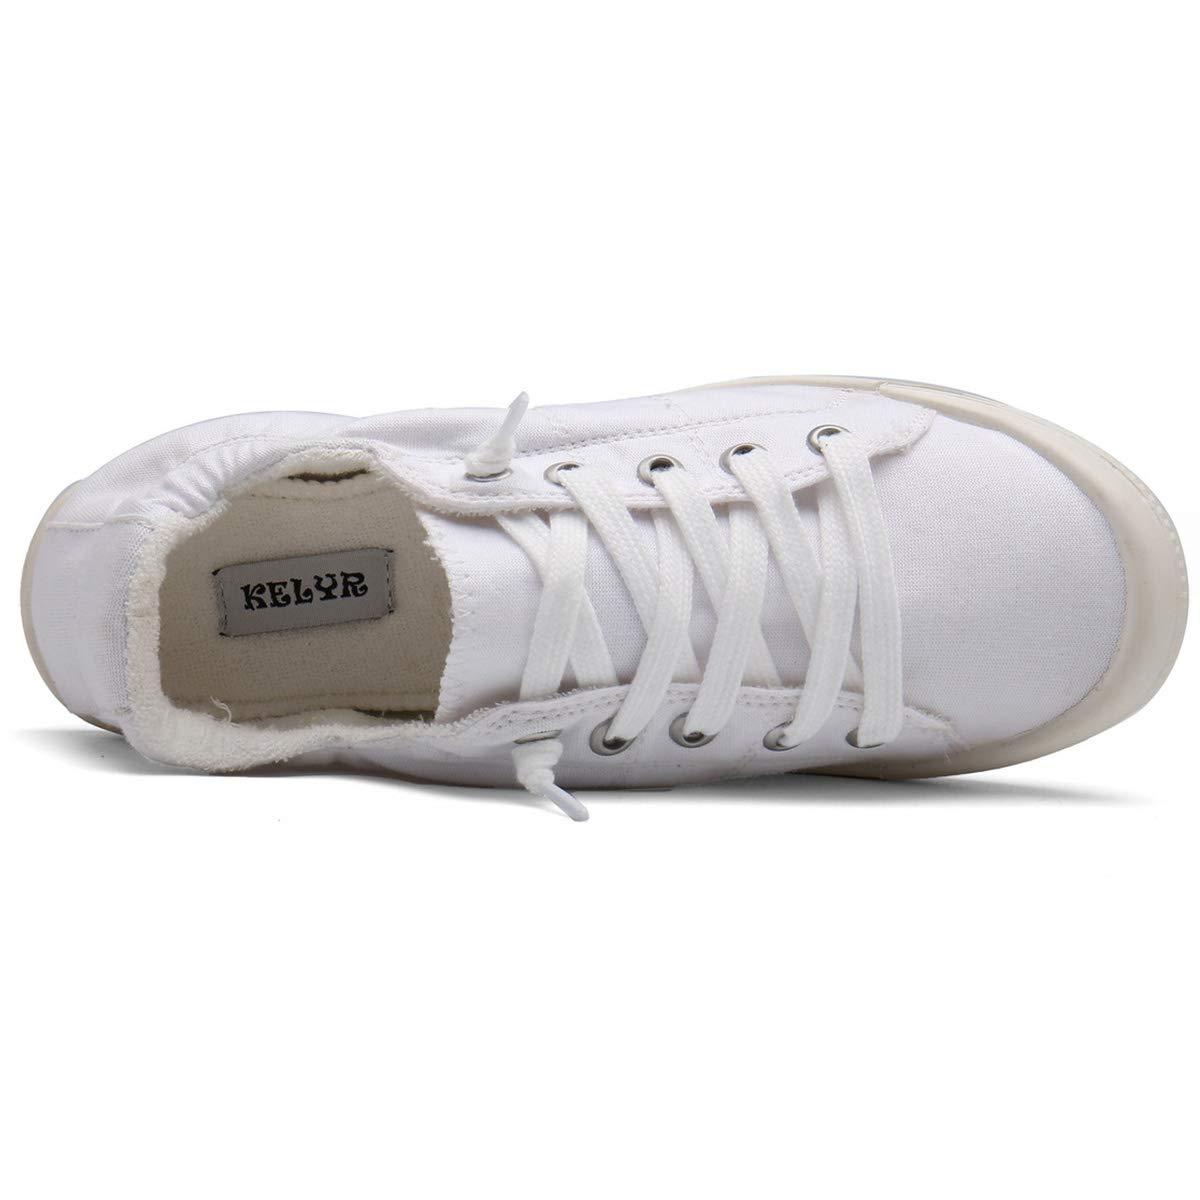 KELYR Women\'s Fashion Sneaker Slip On Shoes Classic&Comfort,White